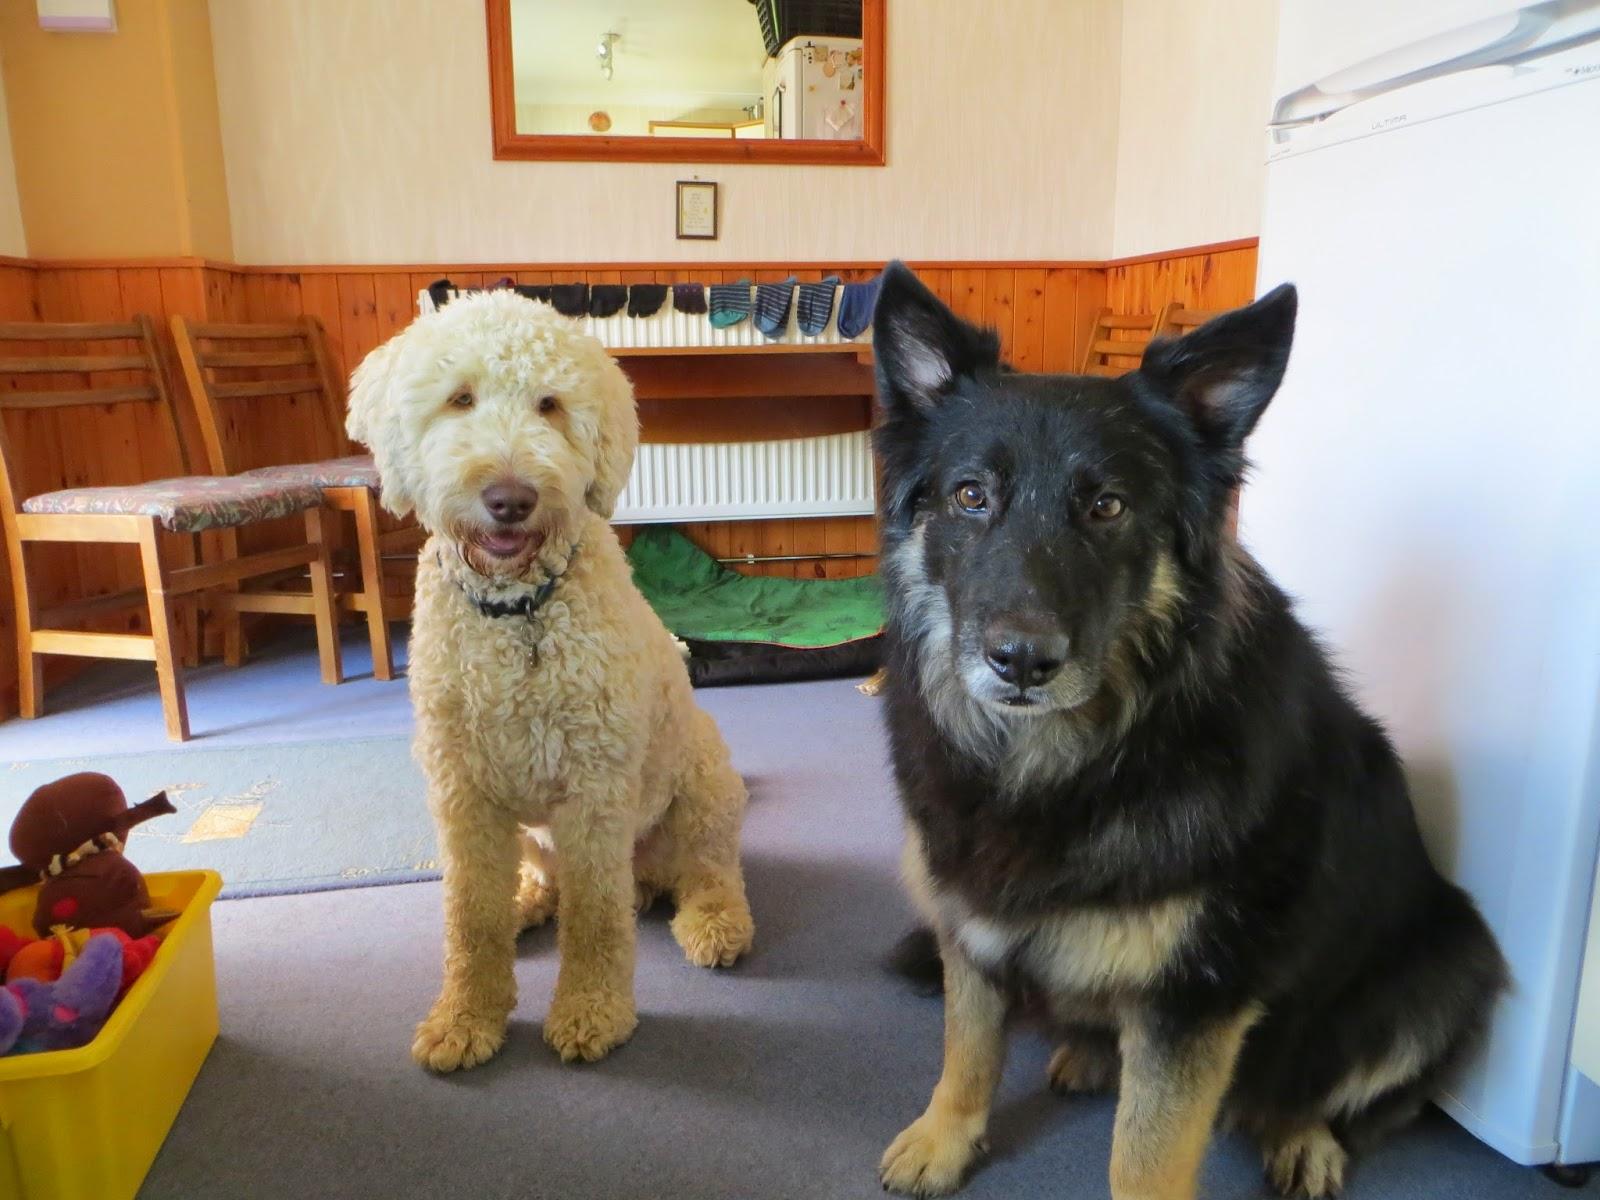 Labradoodle Suny and Collie/Shepherd Trojan